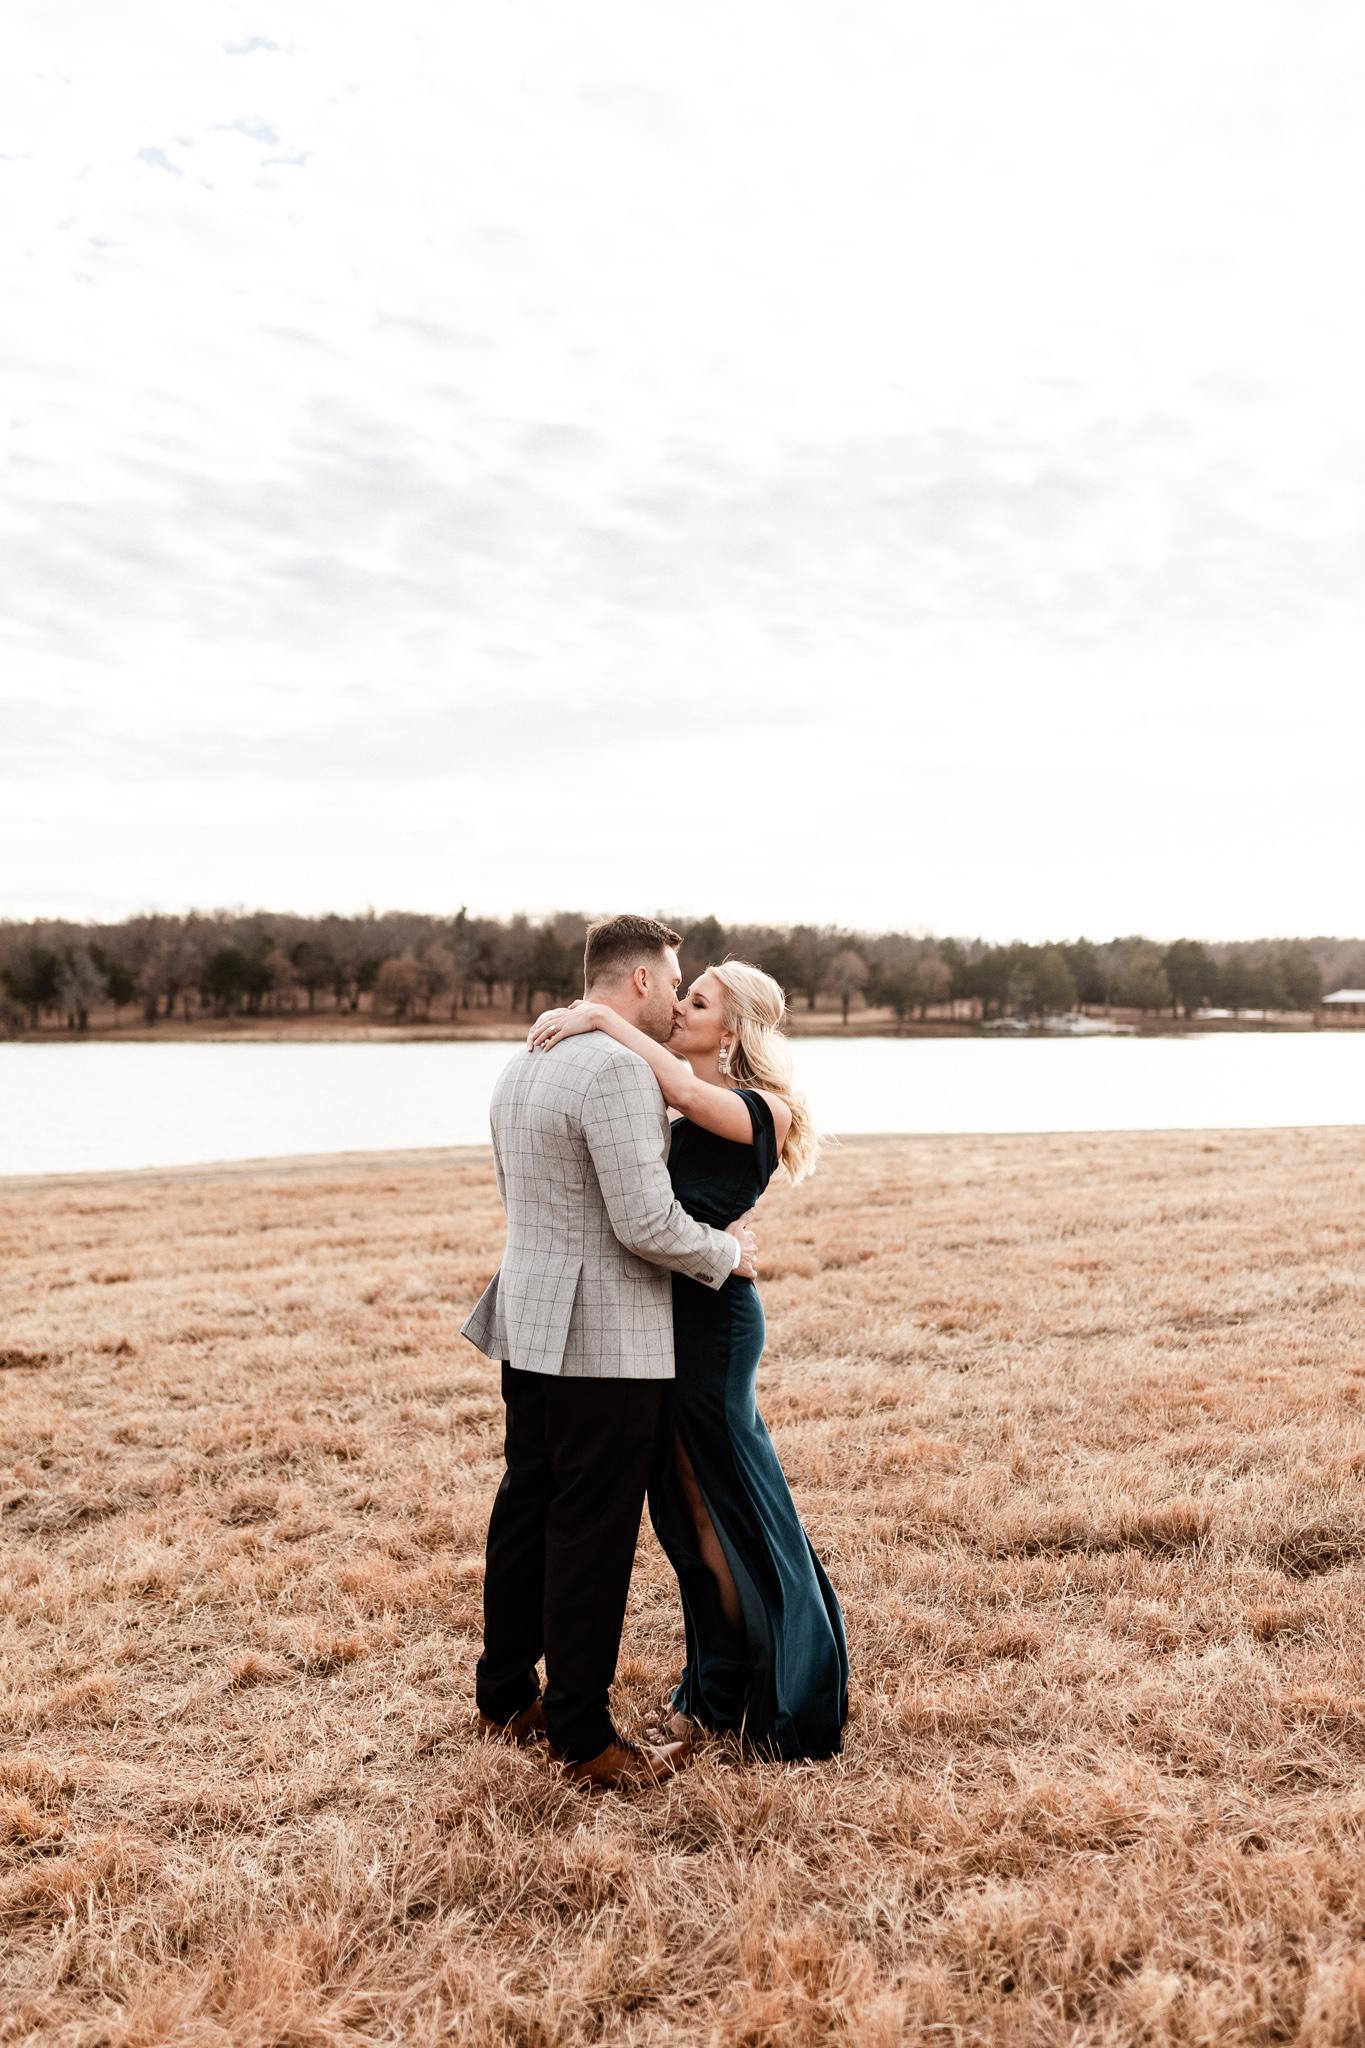 Wade + Stephanie | Warm Open Field Engagements | Oklahoma Wedding Photographer-13.jpg